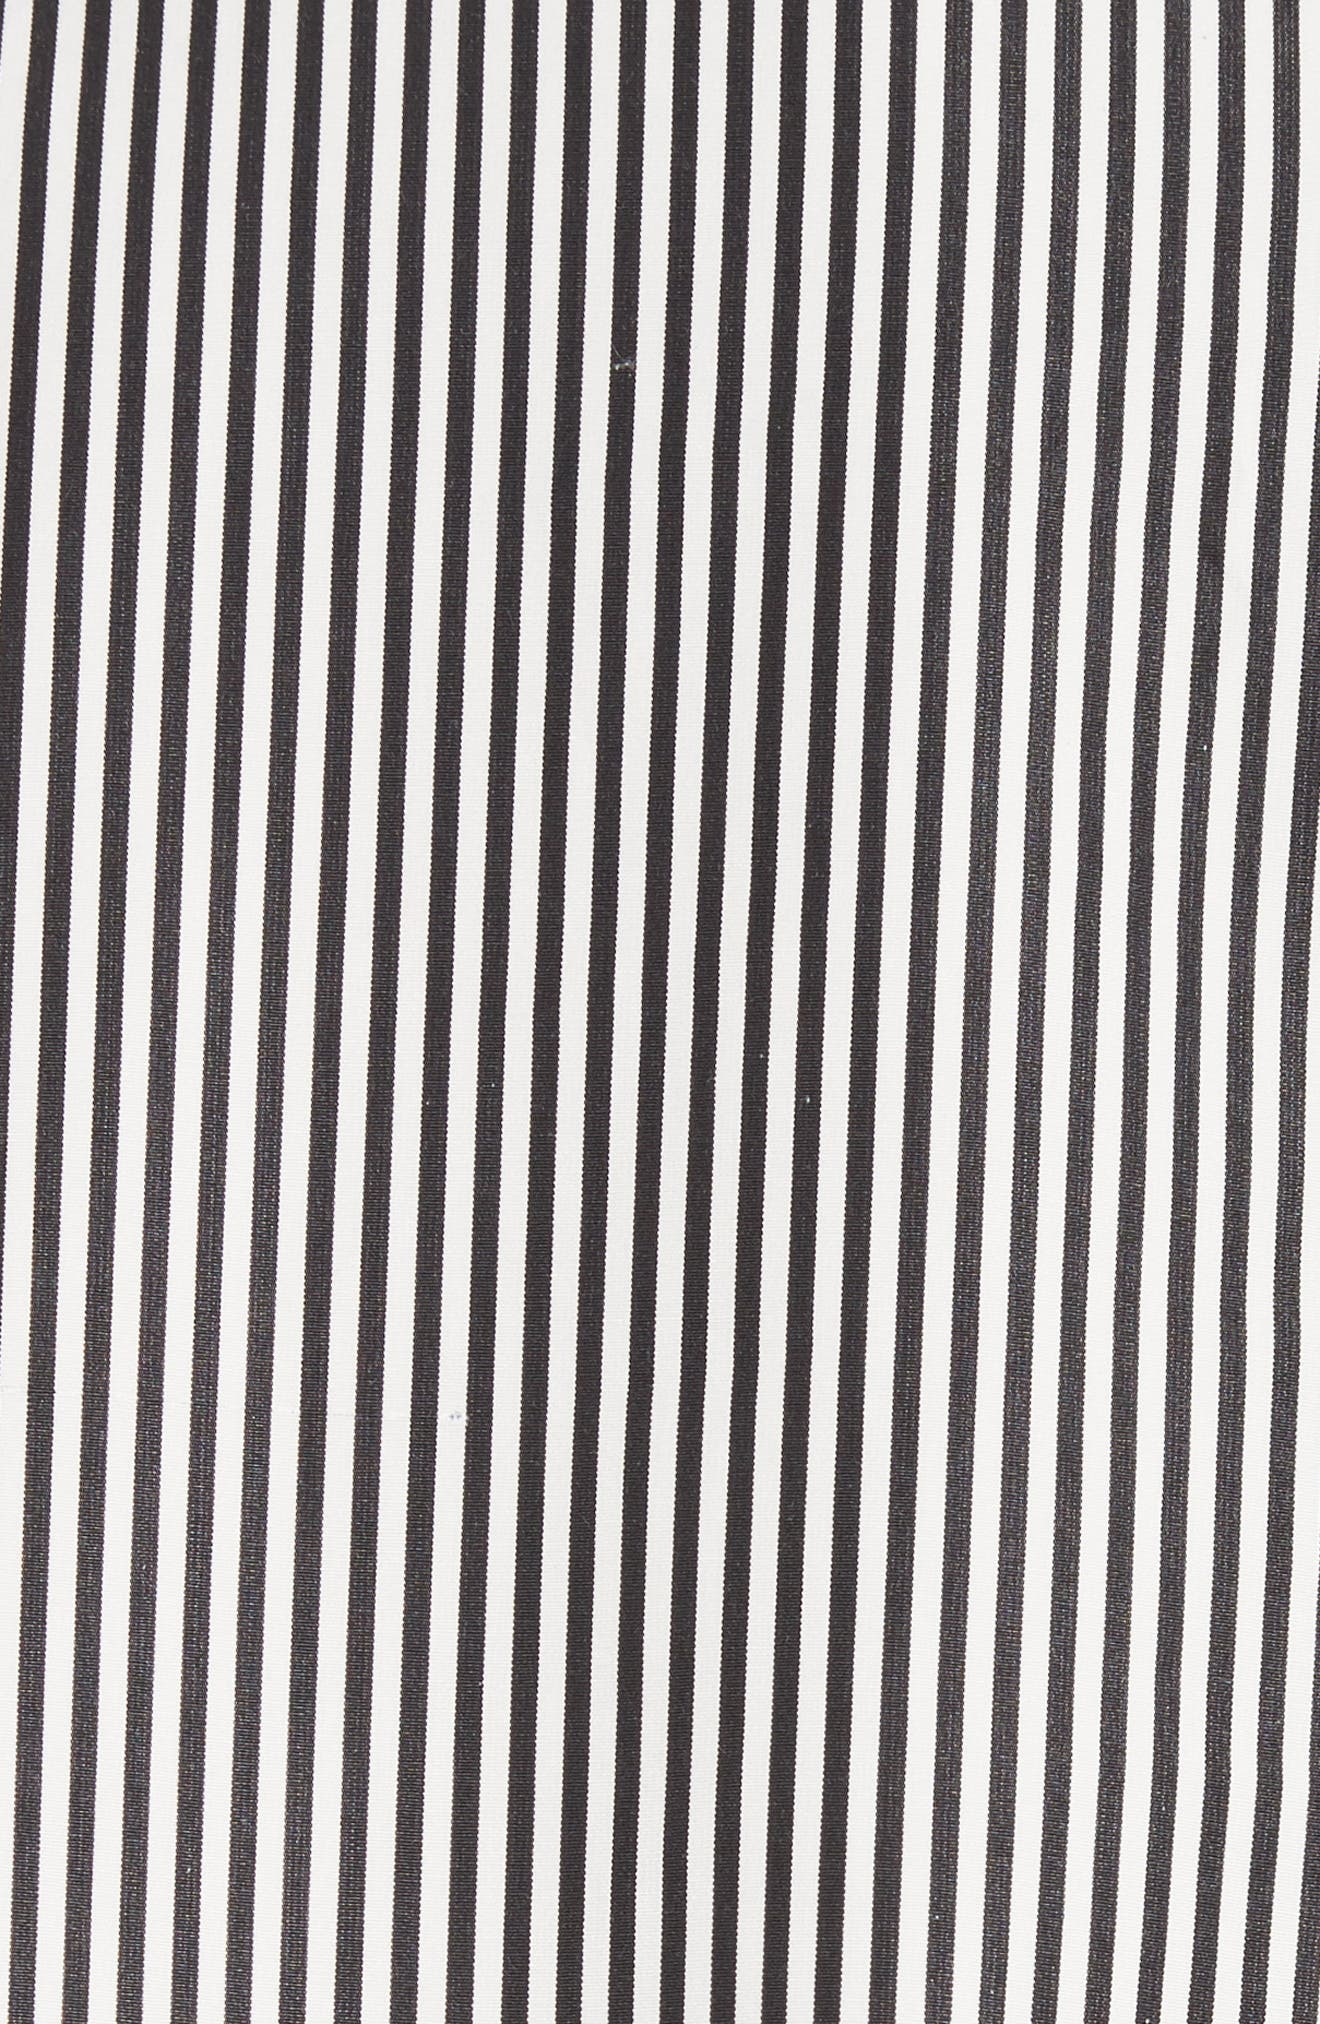 Gwendolyn Blouse,                             Alternate thumbnail 5, color,                             Black Multi